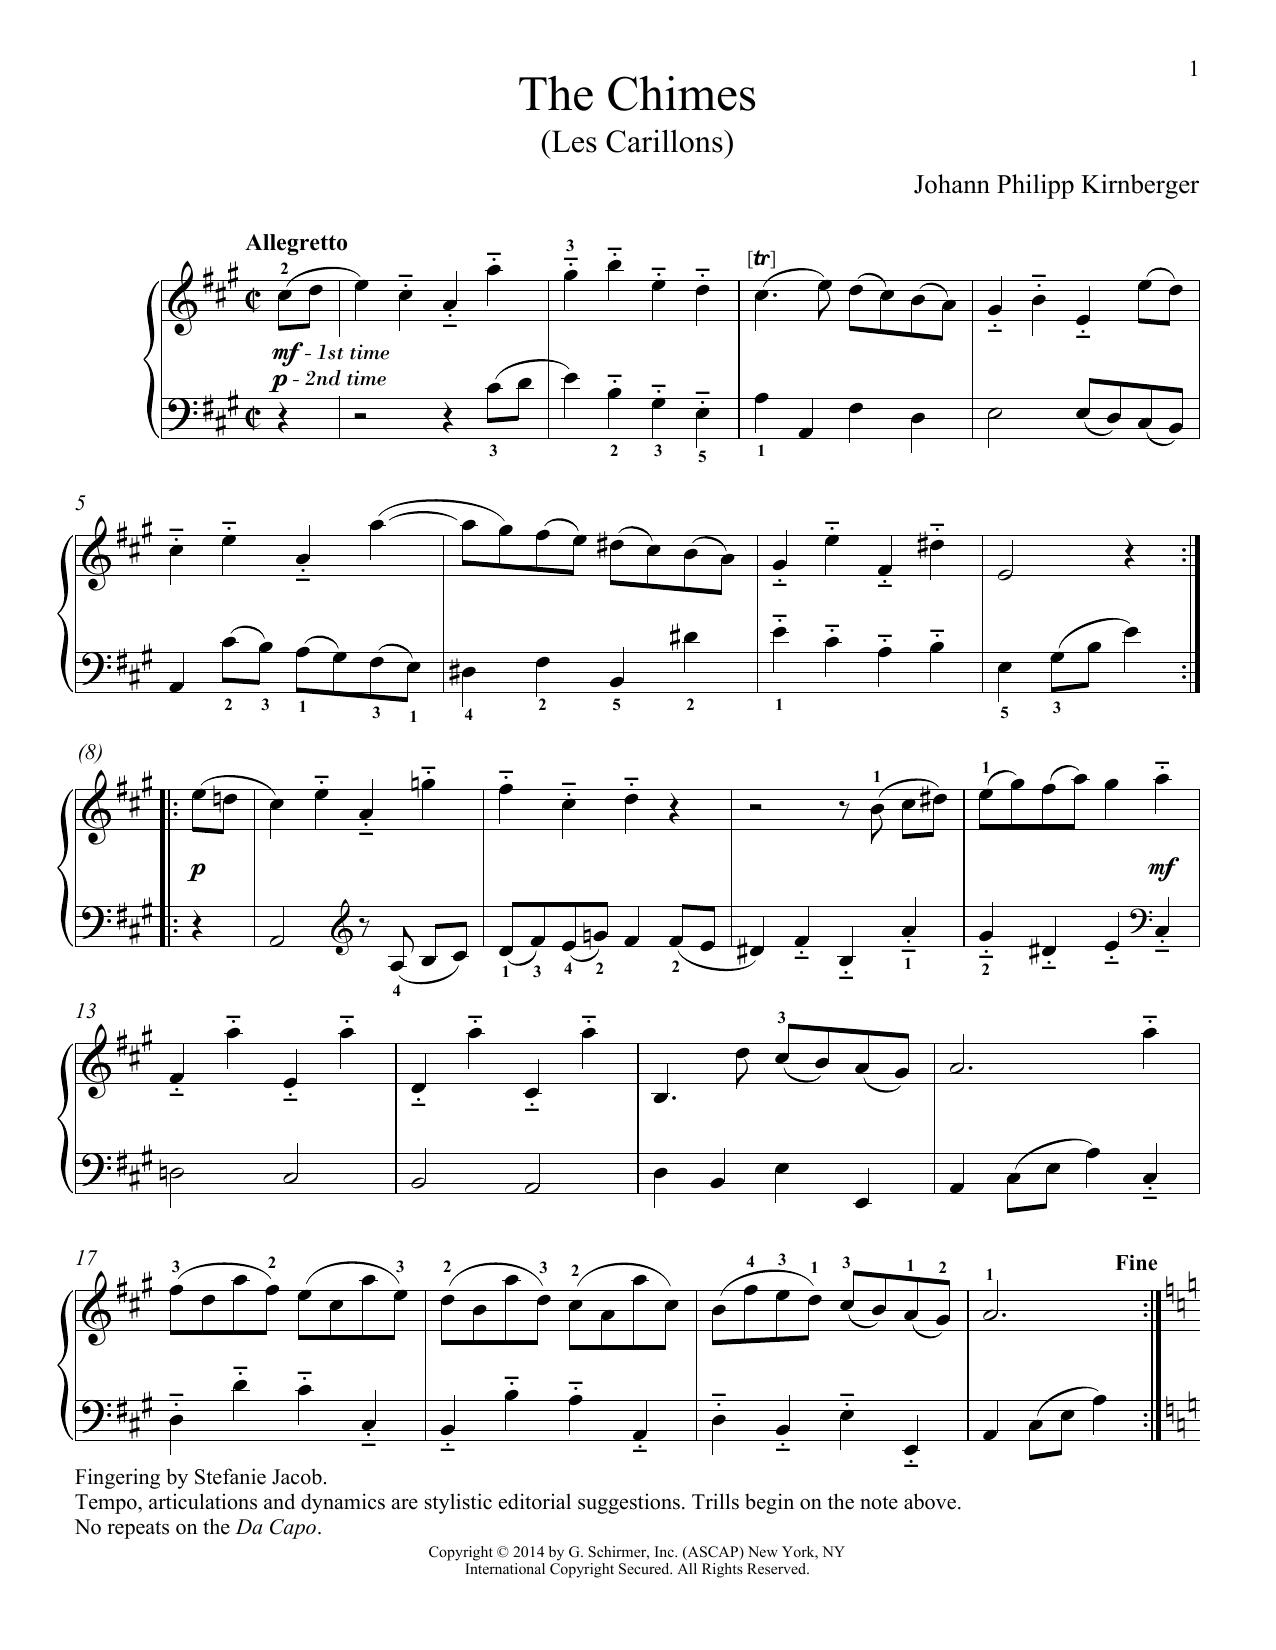 Les Carillons Sheet Music